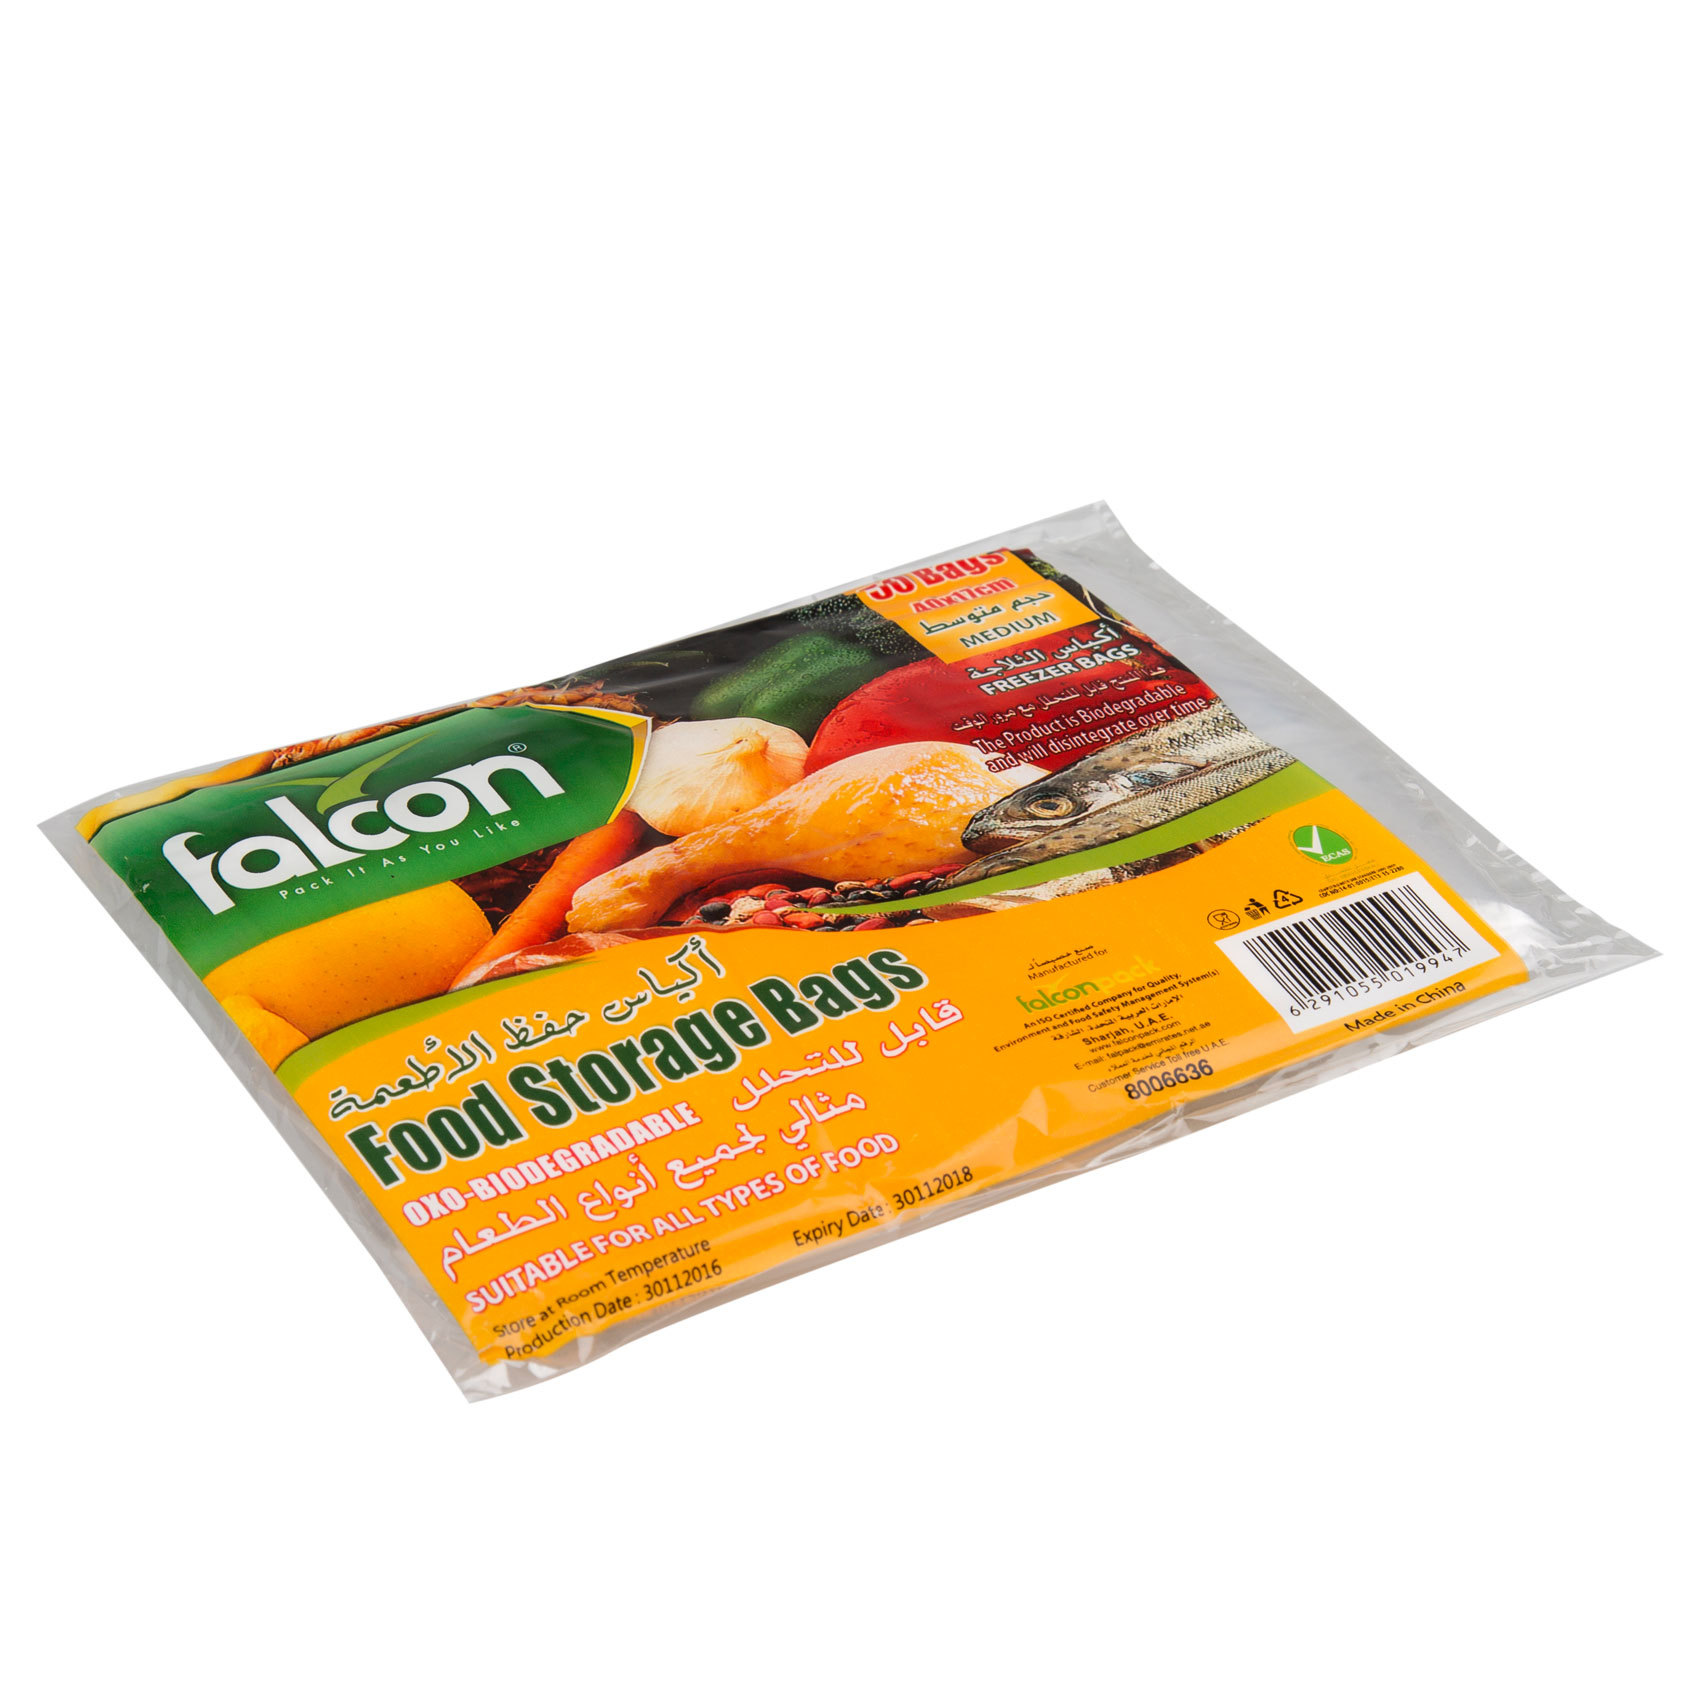 FALCON FOOD STORAGE BAGS 40X17CM